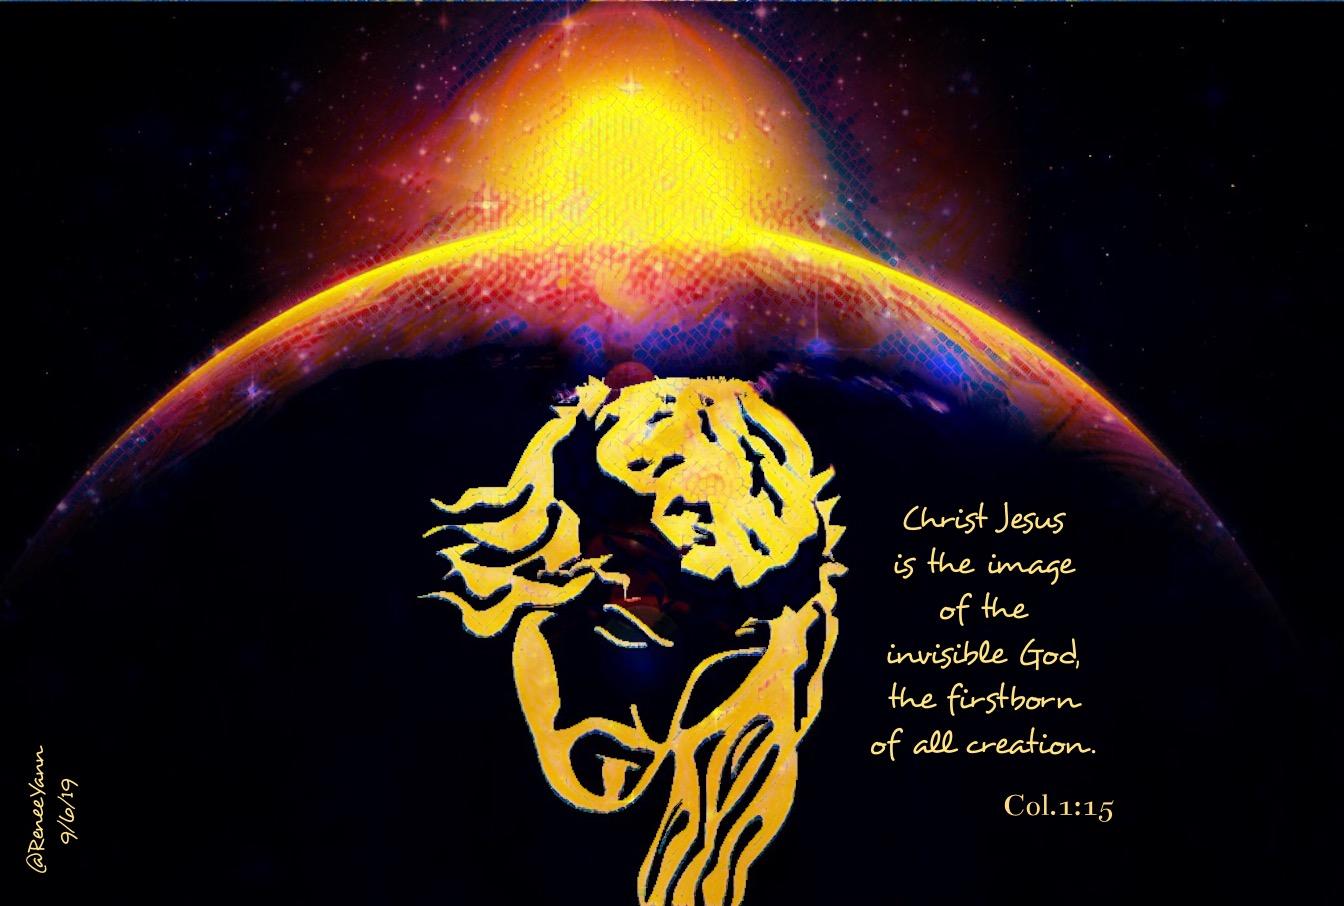 Col1_15 image of God